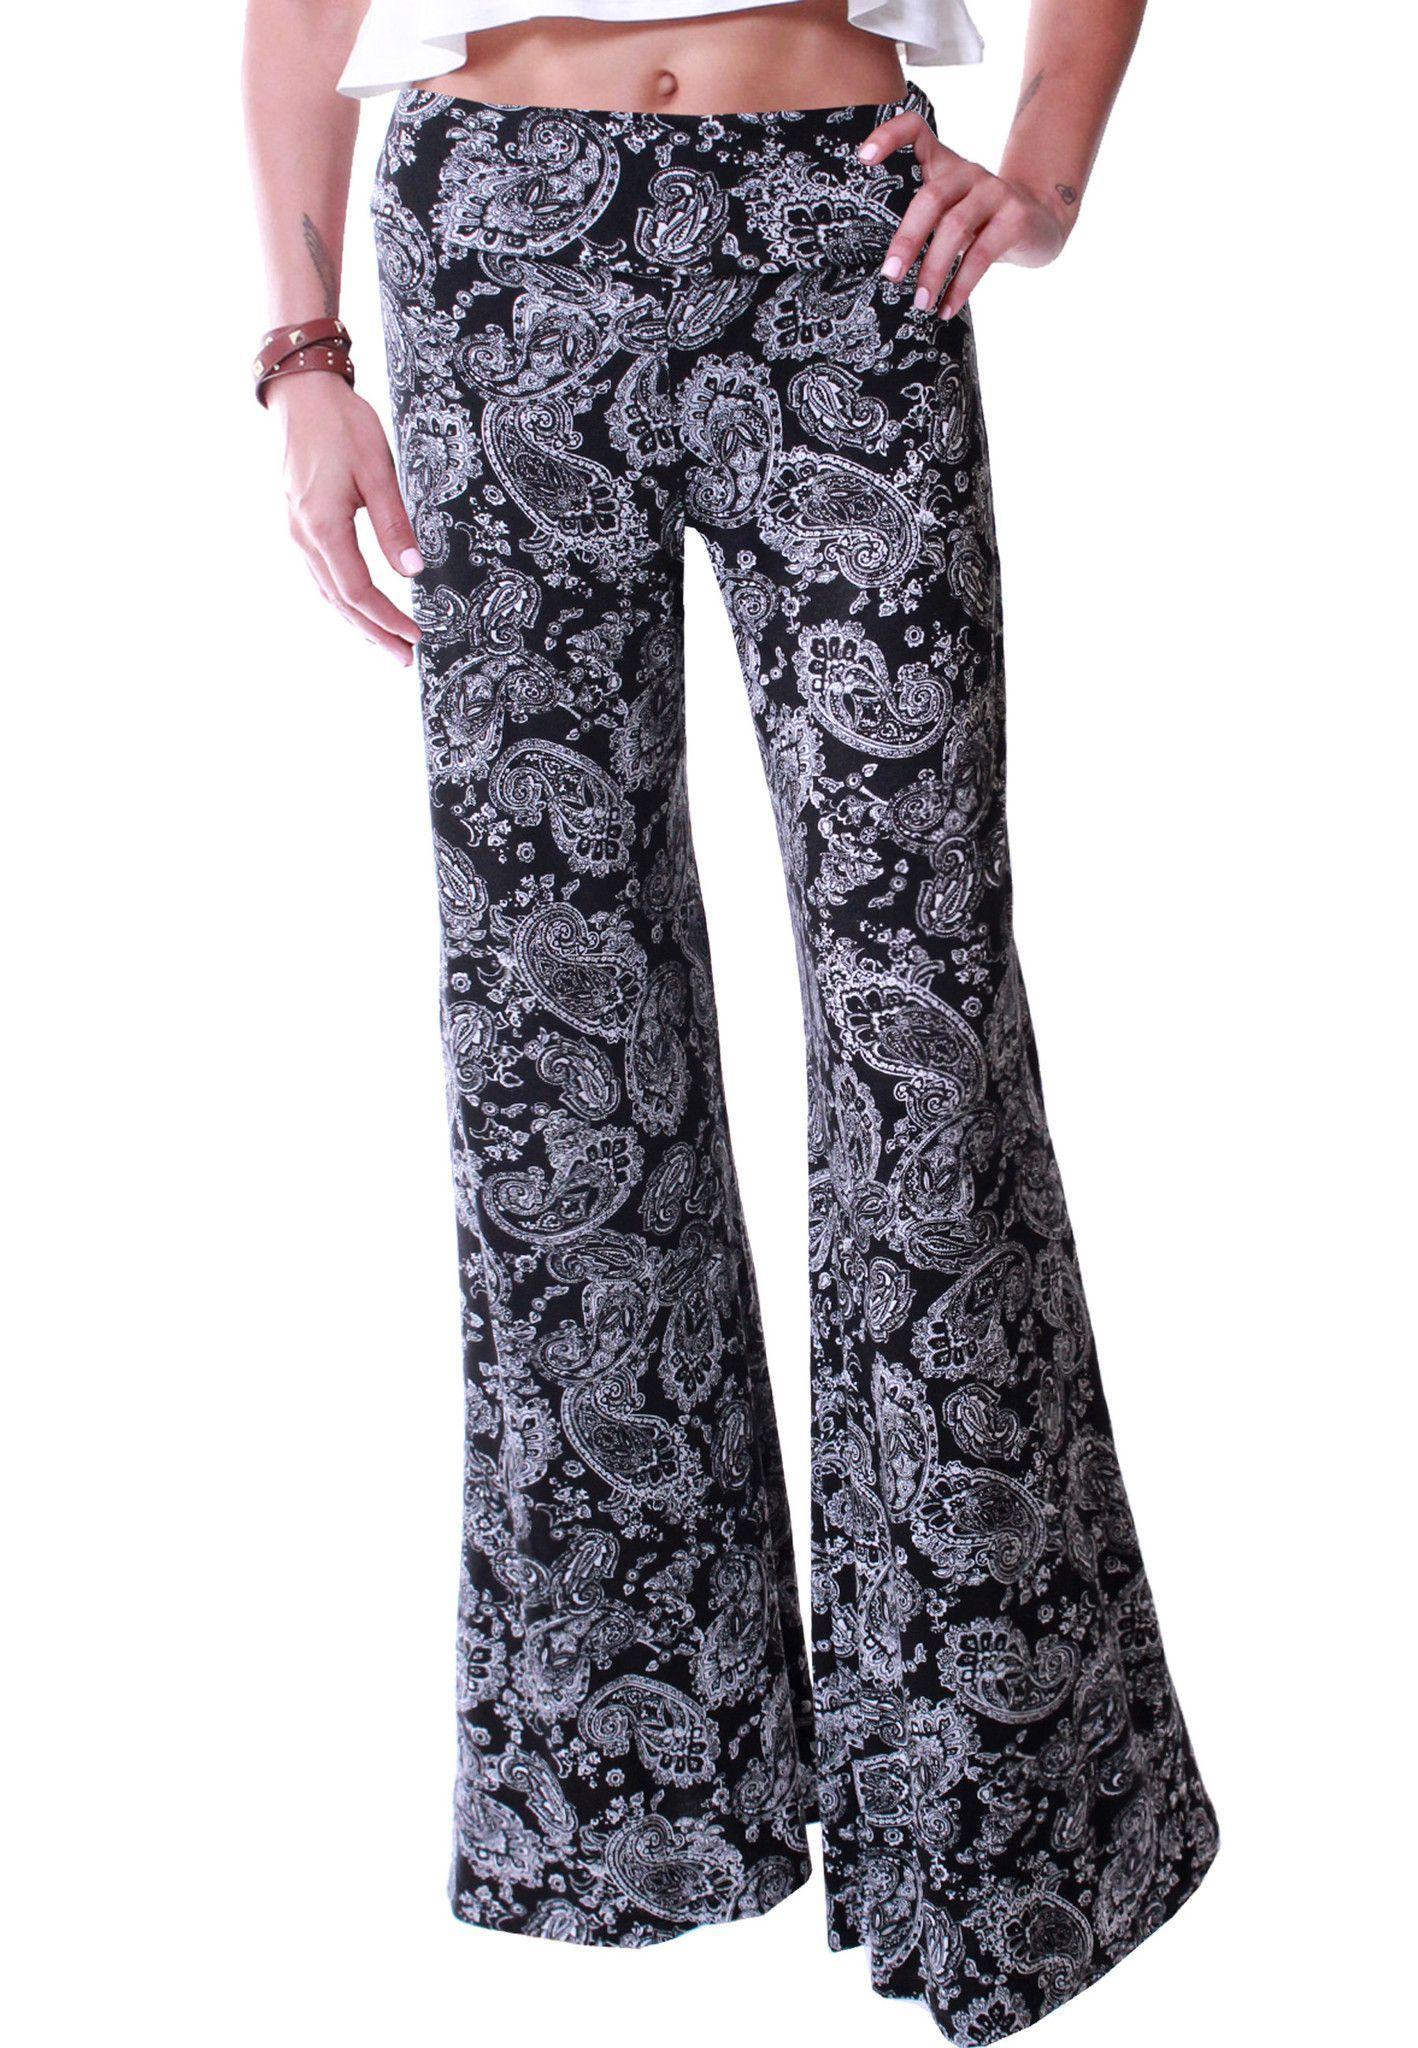 High Waist Printed Palazzo Wide Leg Pants - P6235